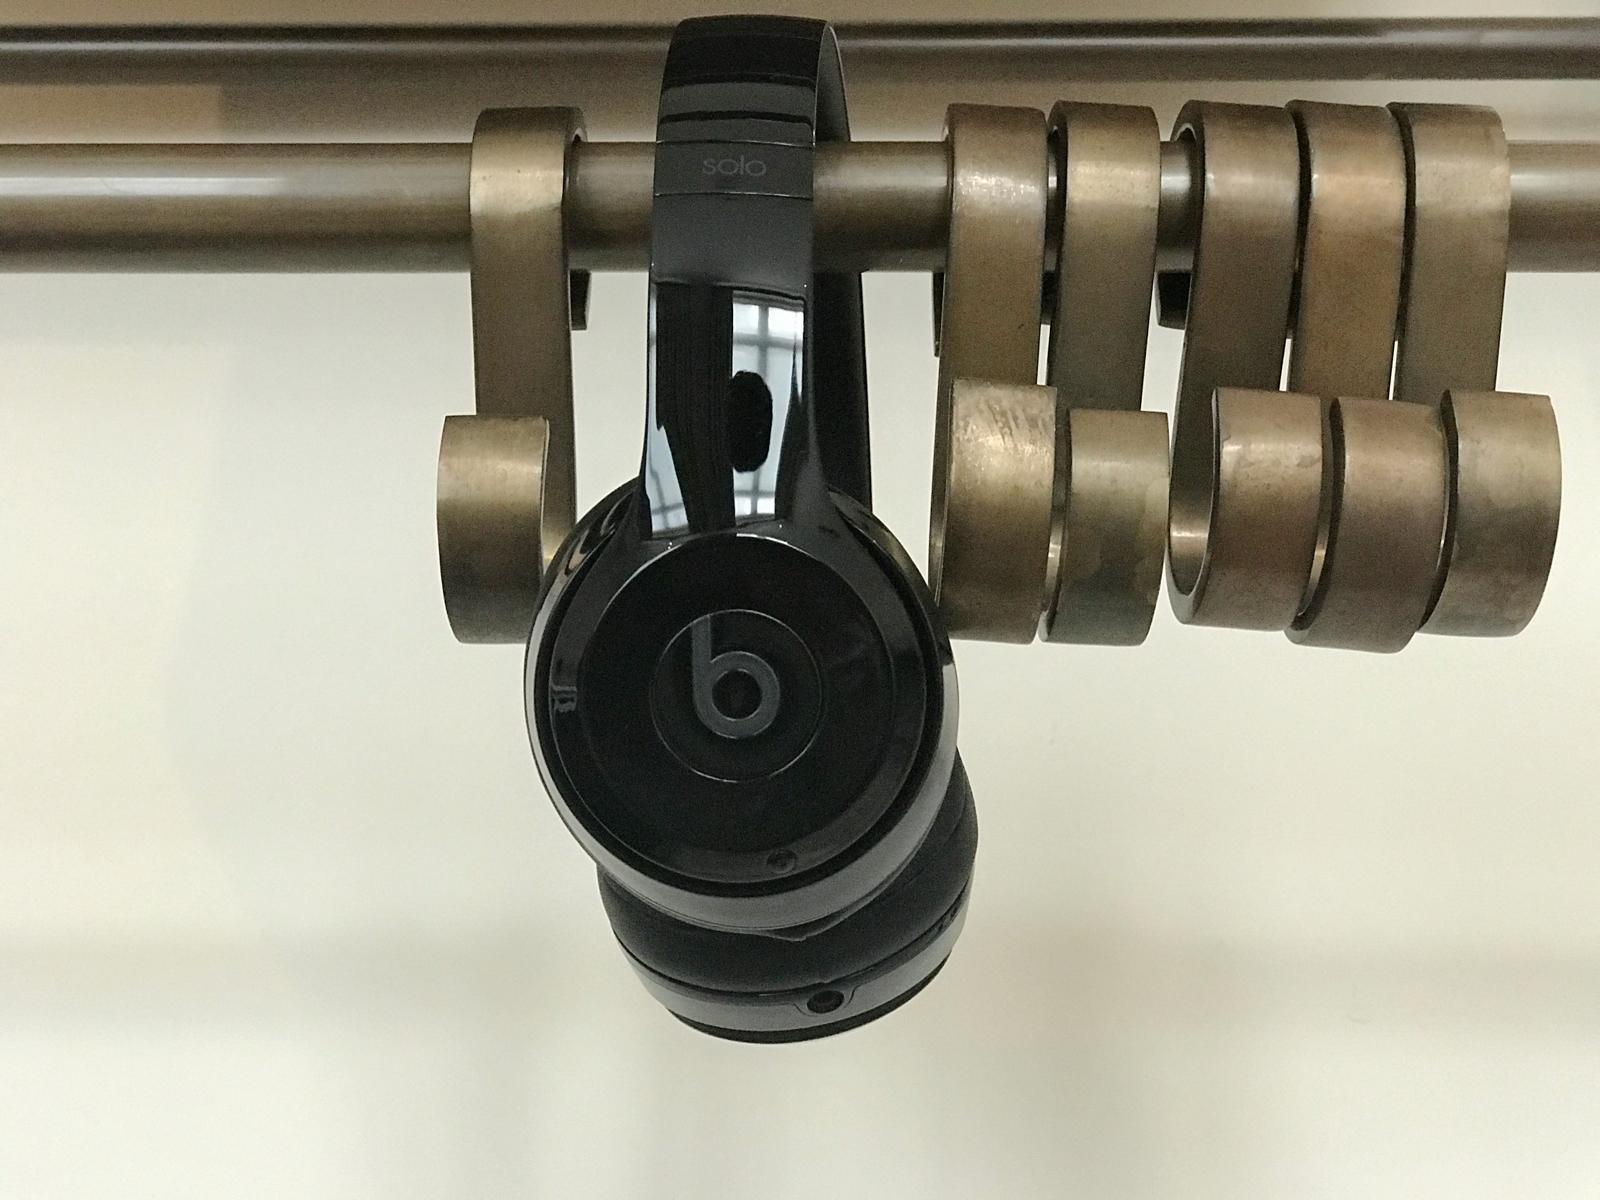 Beats By Dr Dre Solo 3 Wireless